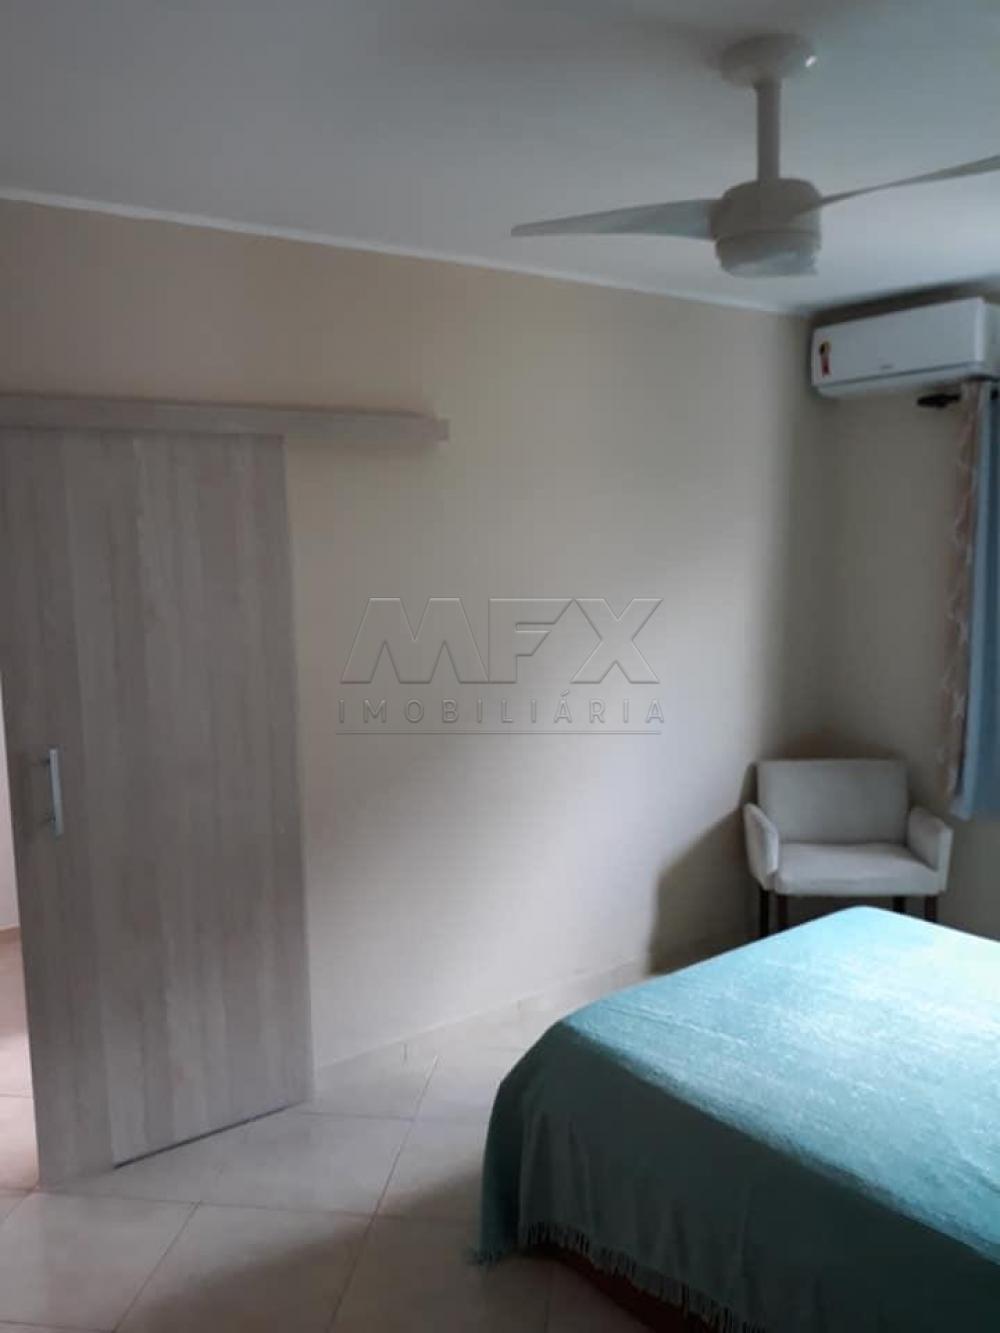 Comprar Casa / Condomínio em Bauru apenas R$ 750.000,00 - Foto 8